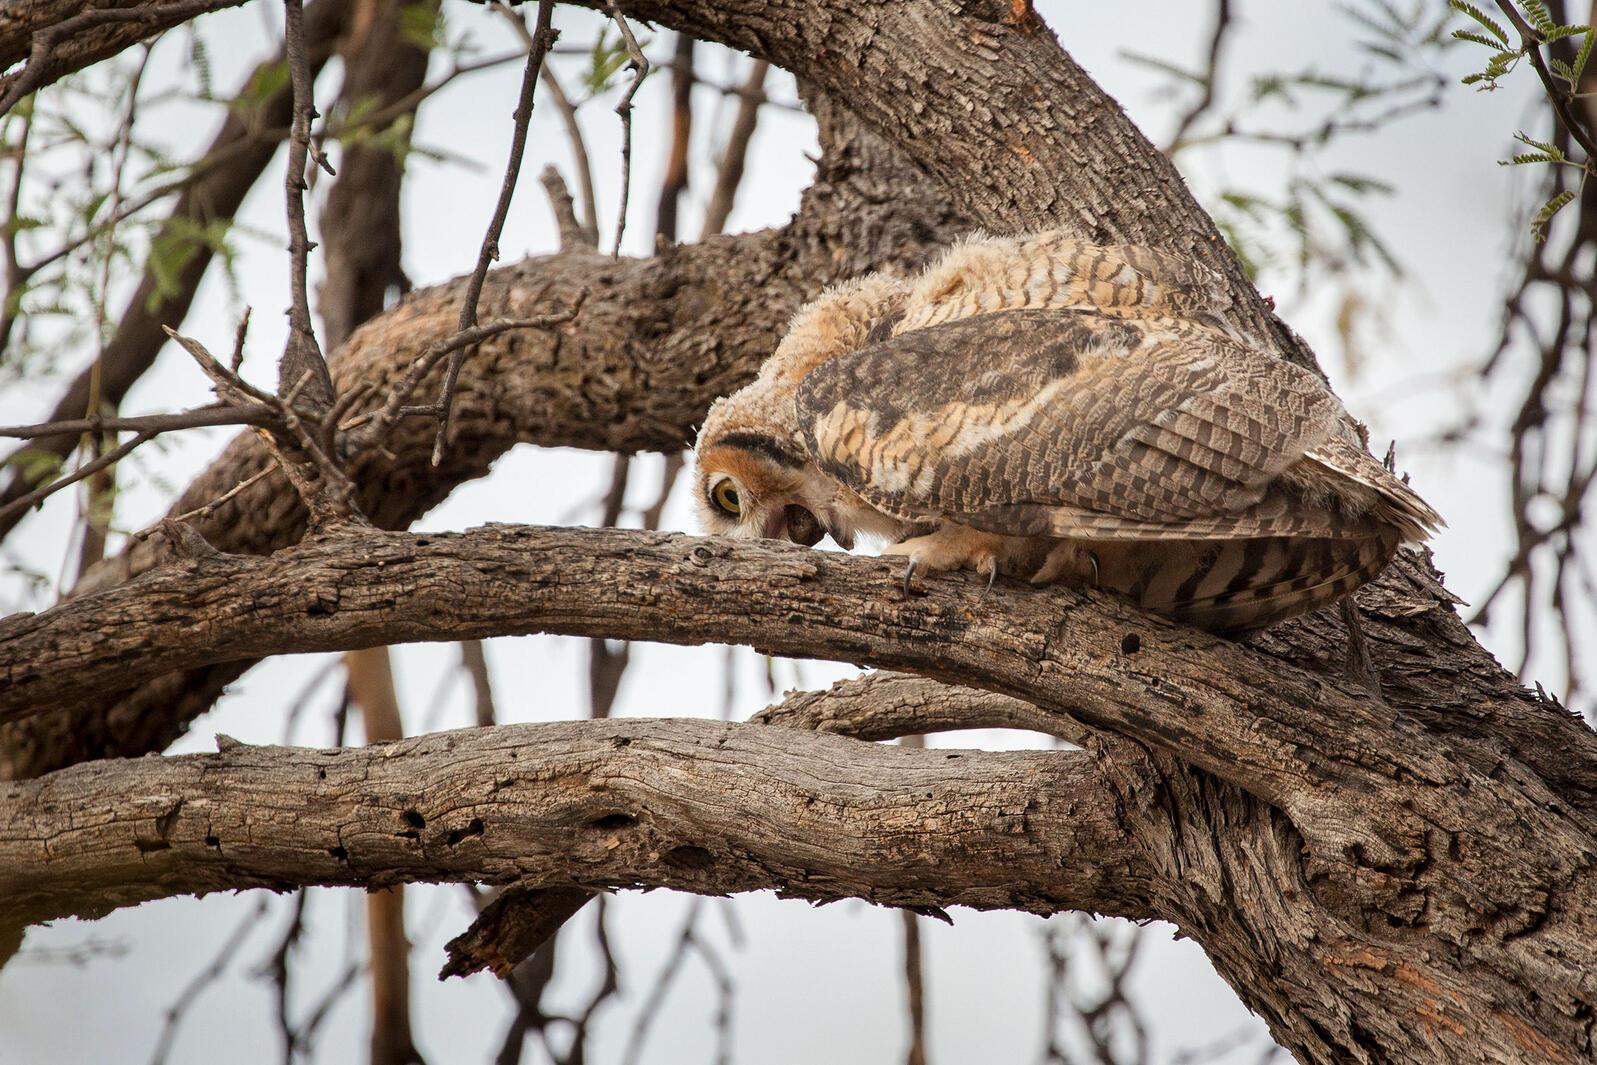 Great Horned Owl. Jason Bazzano/Alamy